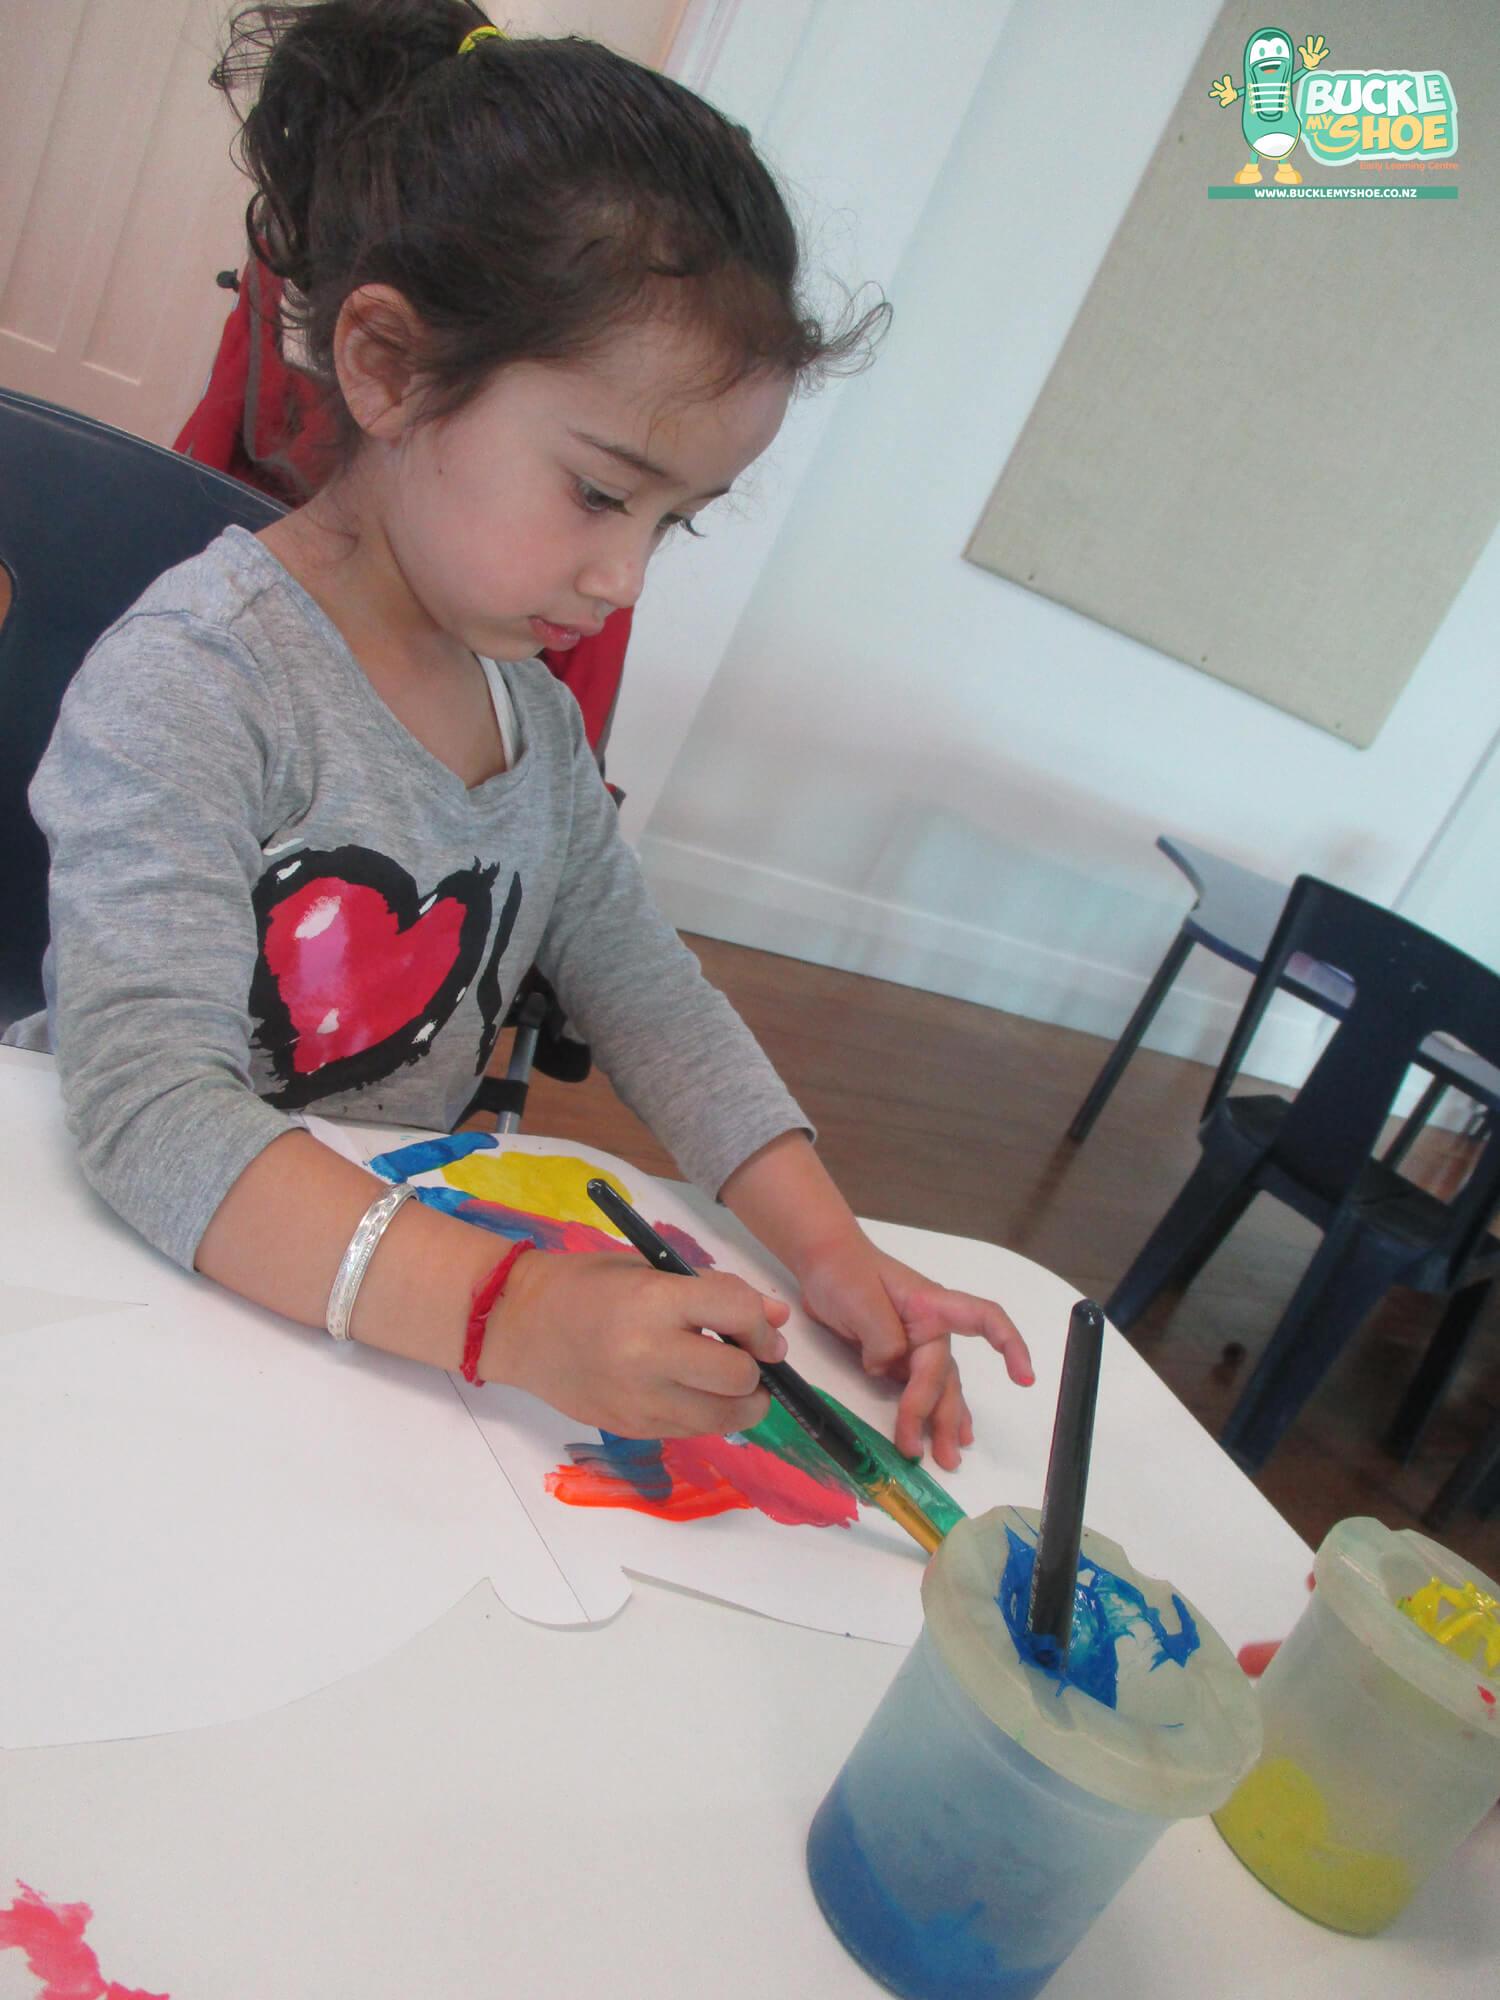 buckle-my-shoe-childcare-tauranga-butterfly-7.jpg